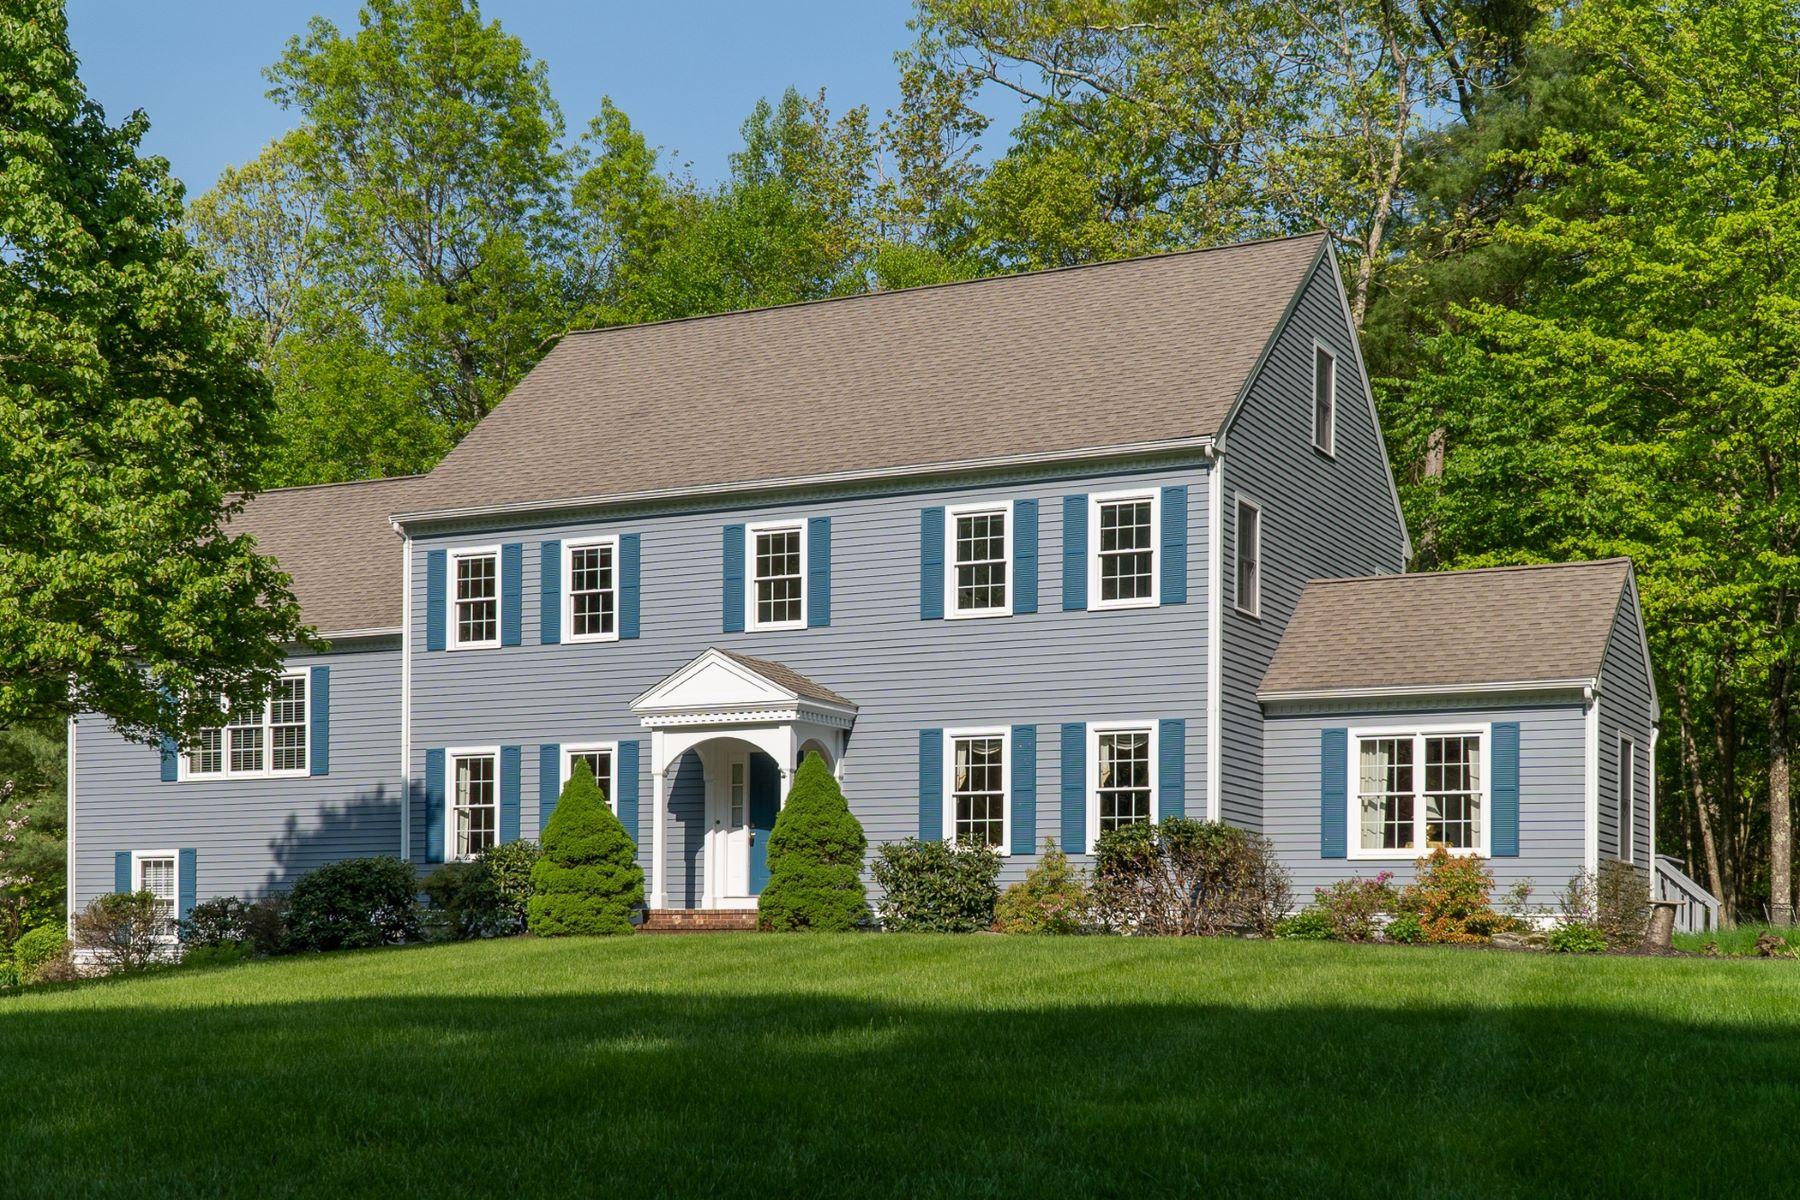 Single Family Homes for Sale at 525 Old Harvard Road Boxborough, Massachusetts 01719 United States